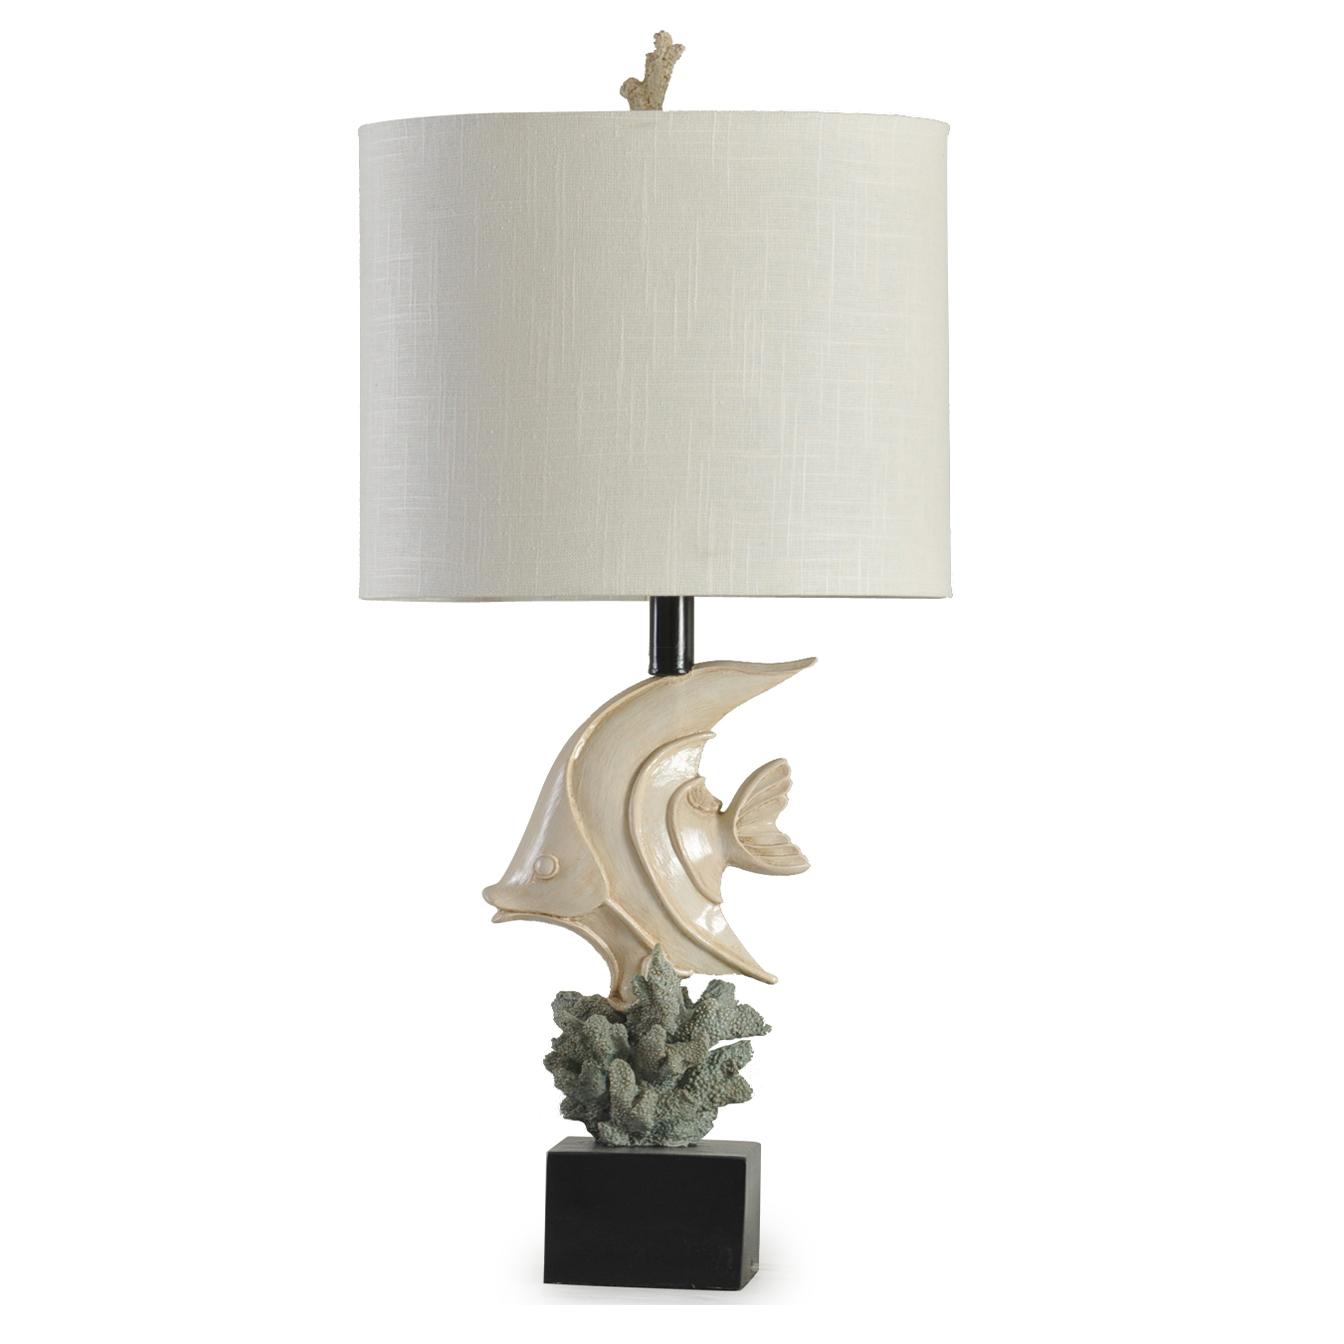 mediterranean style vintage table lamp resin handmade desk top lamp sea fish family decorative lights creative indoor lighting buy mediterranean